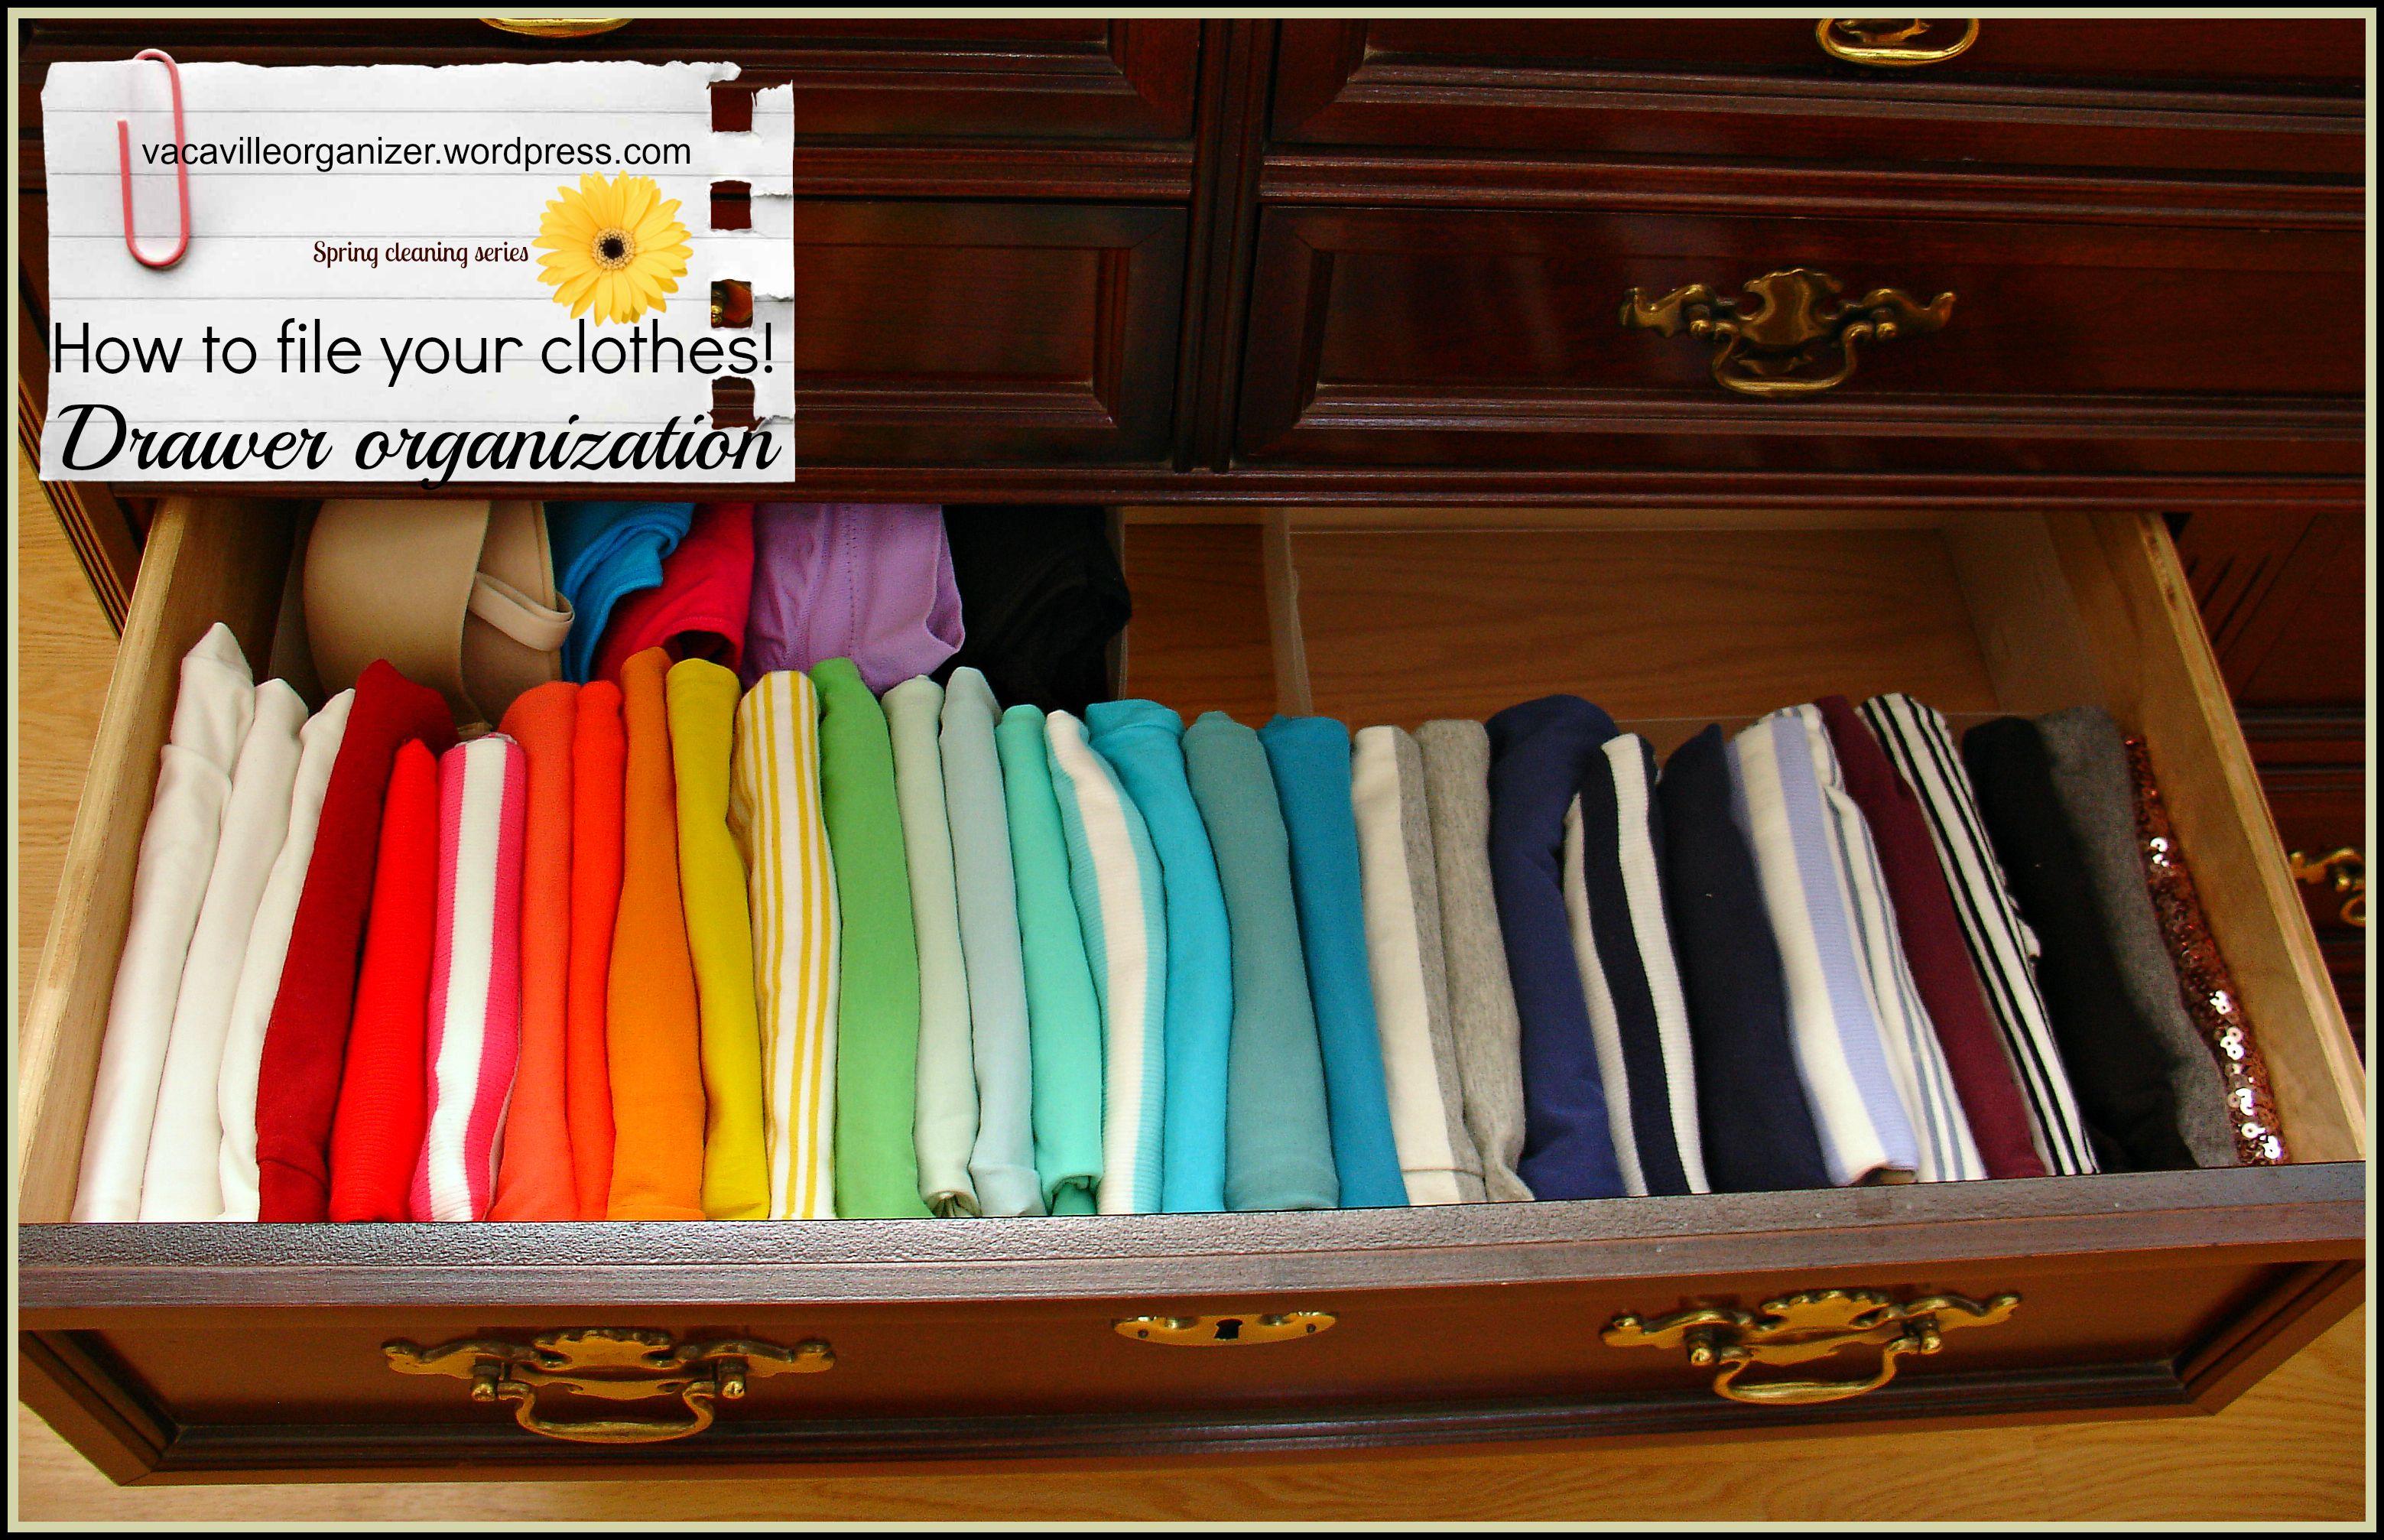 Drawer Organization Ideas Filing Clothes Organize Drawers Deep